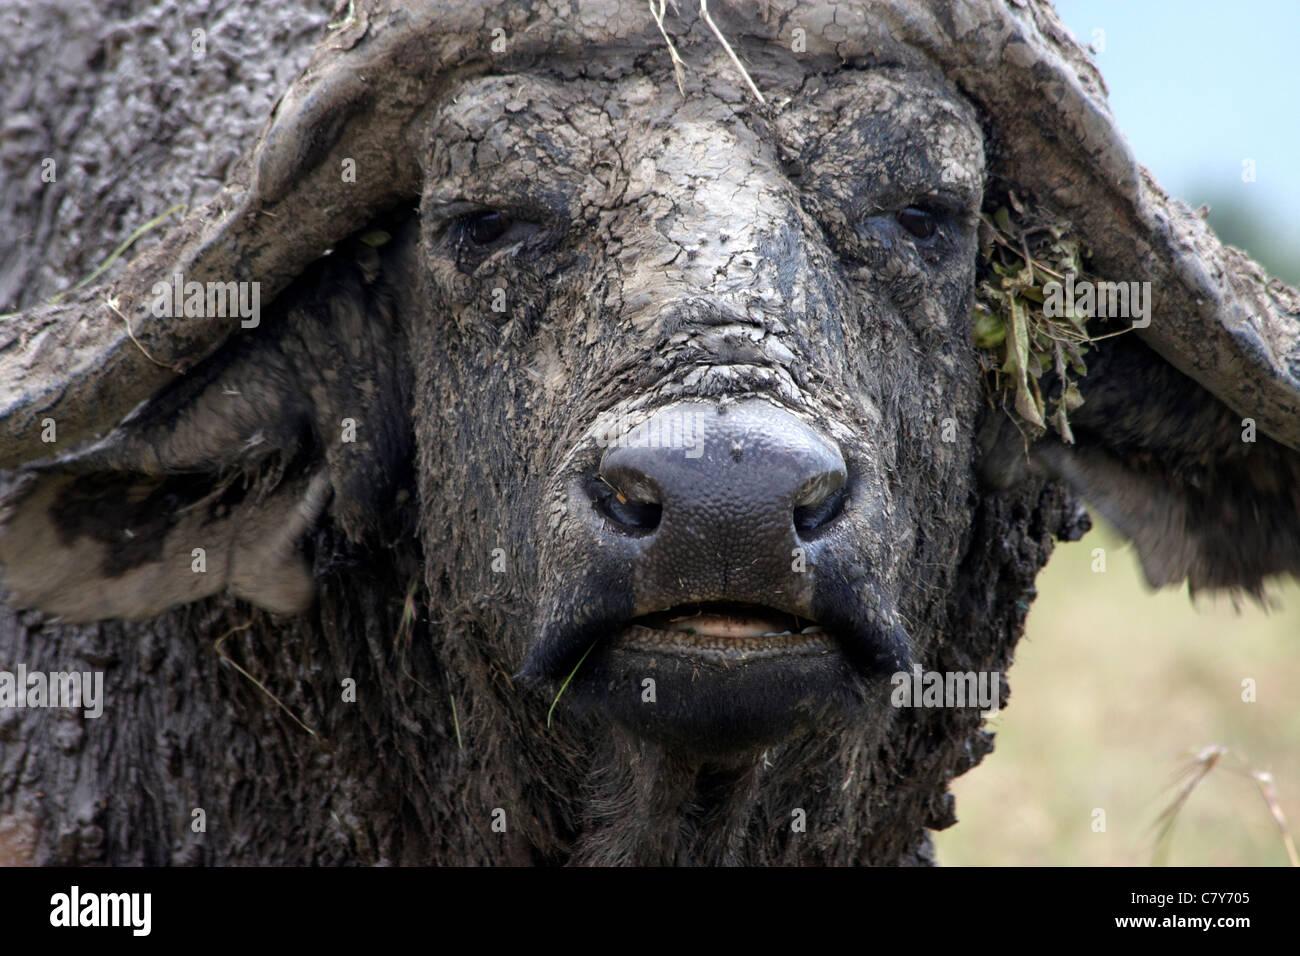 African Buffalo (Syncerus caffer) - Stock Image